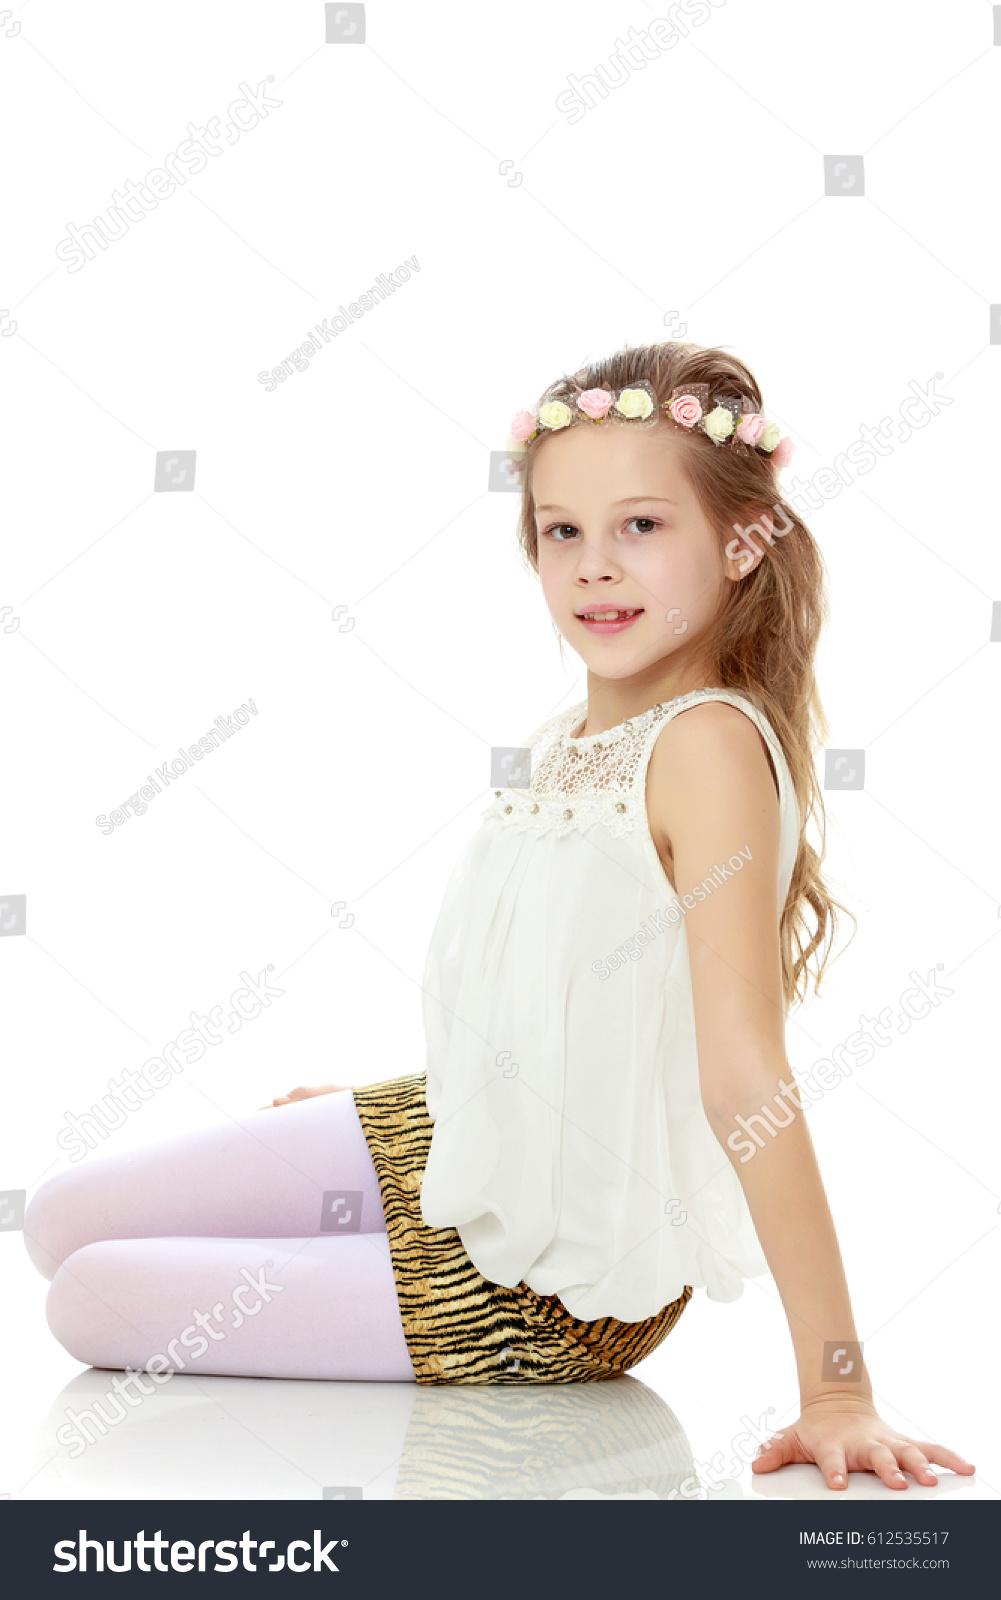 royaltyfree beautiful little girl in mini skirt